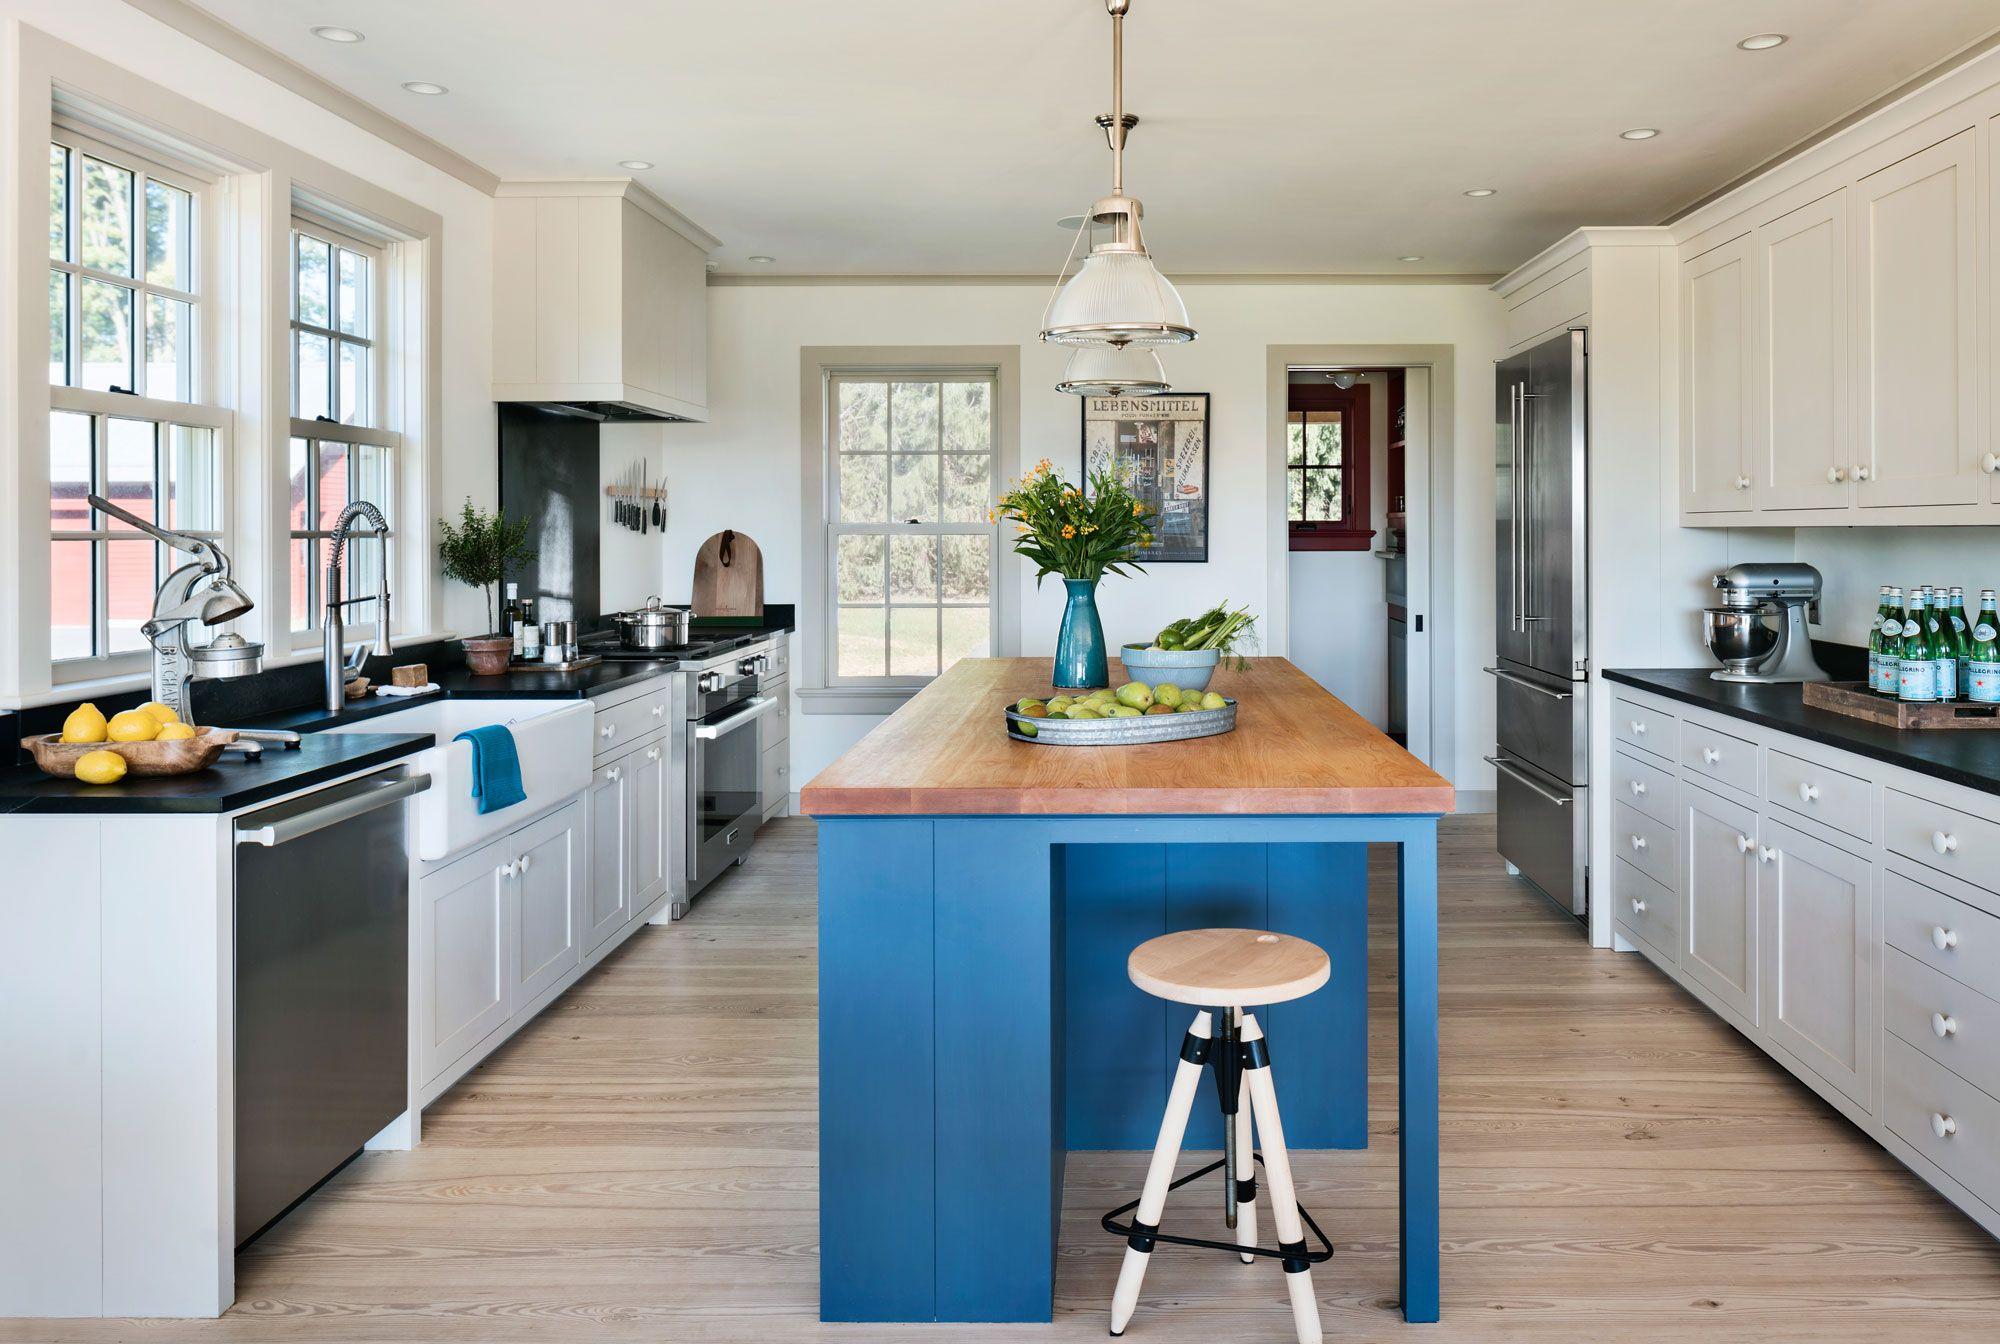 Rafe Churchill Traditional Houses | A Modern Farmhouse | Interiors ...